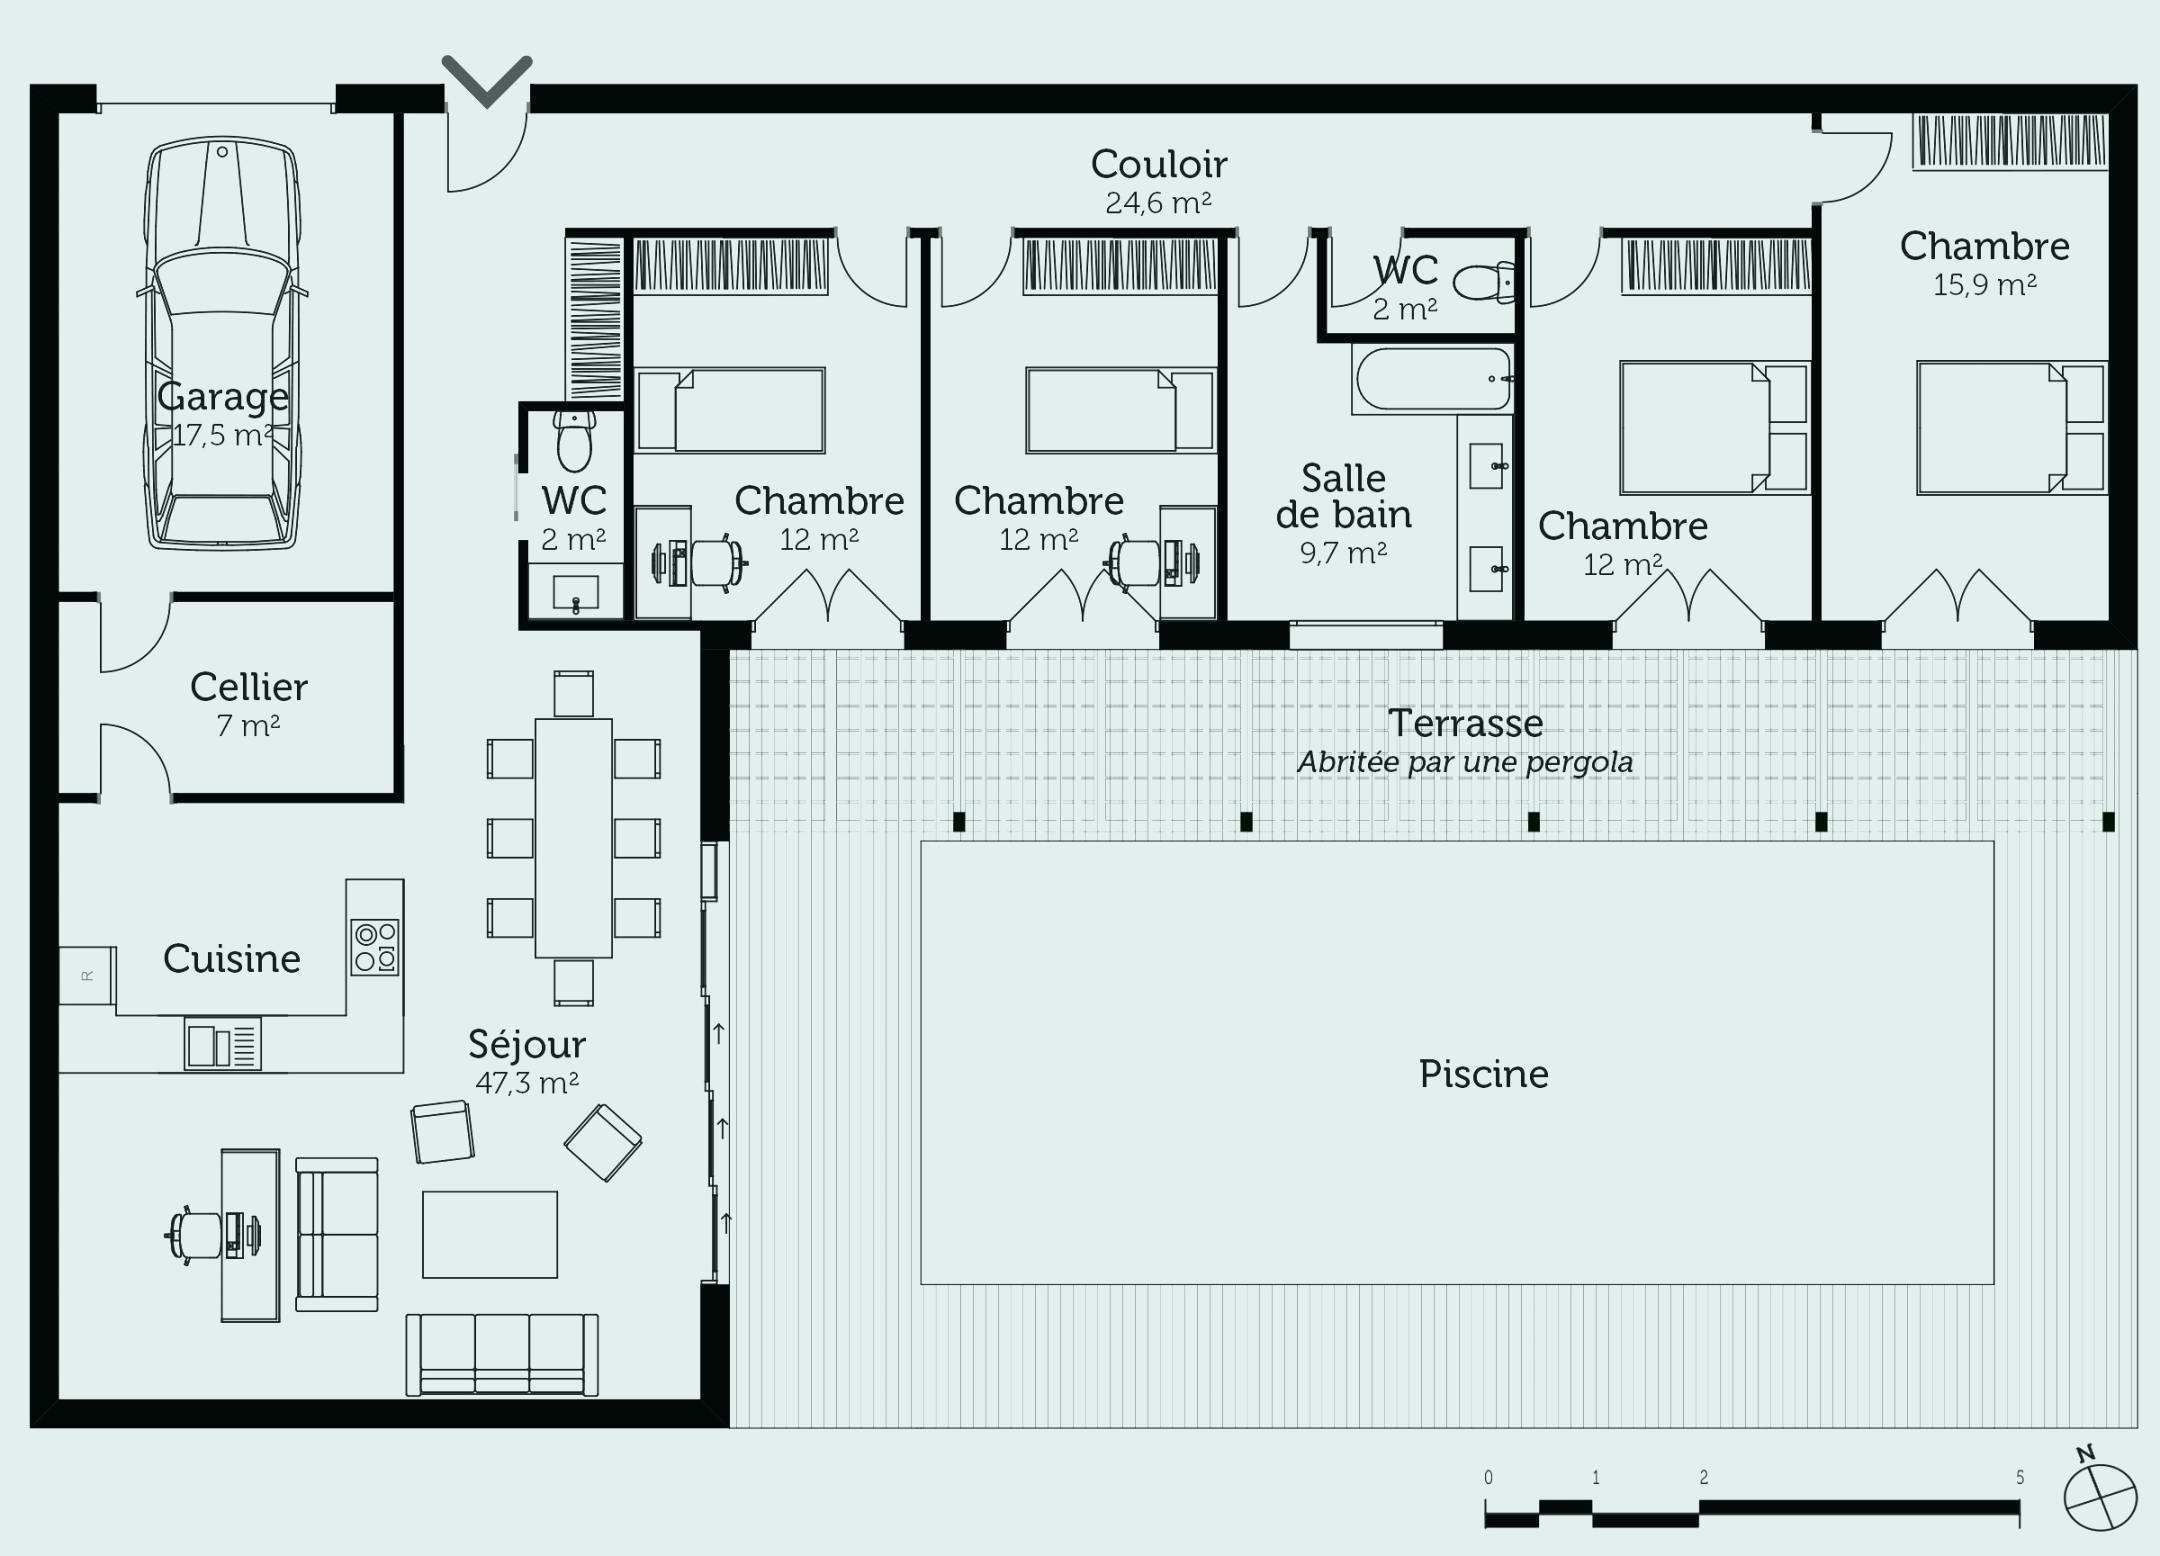 Find Inspiration About Plan De Maison En L Plain Pied Elegant Plan De Maison Plain Pied 3 Plan Maison 7 Casas Em Contentores Plantas De Casas Casas Avarandadas